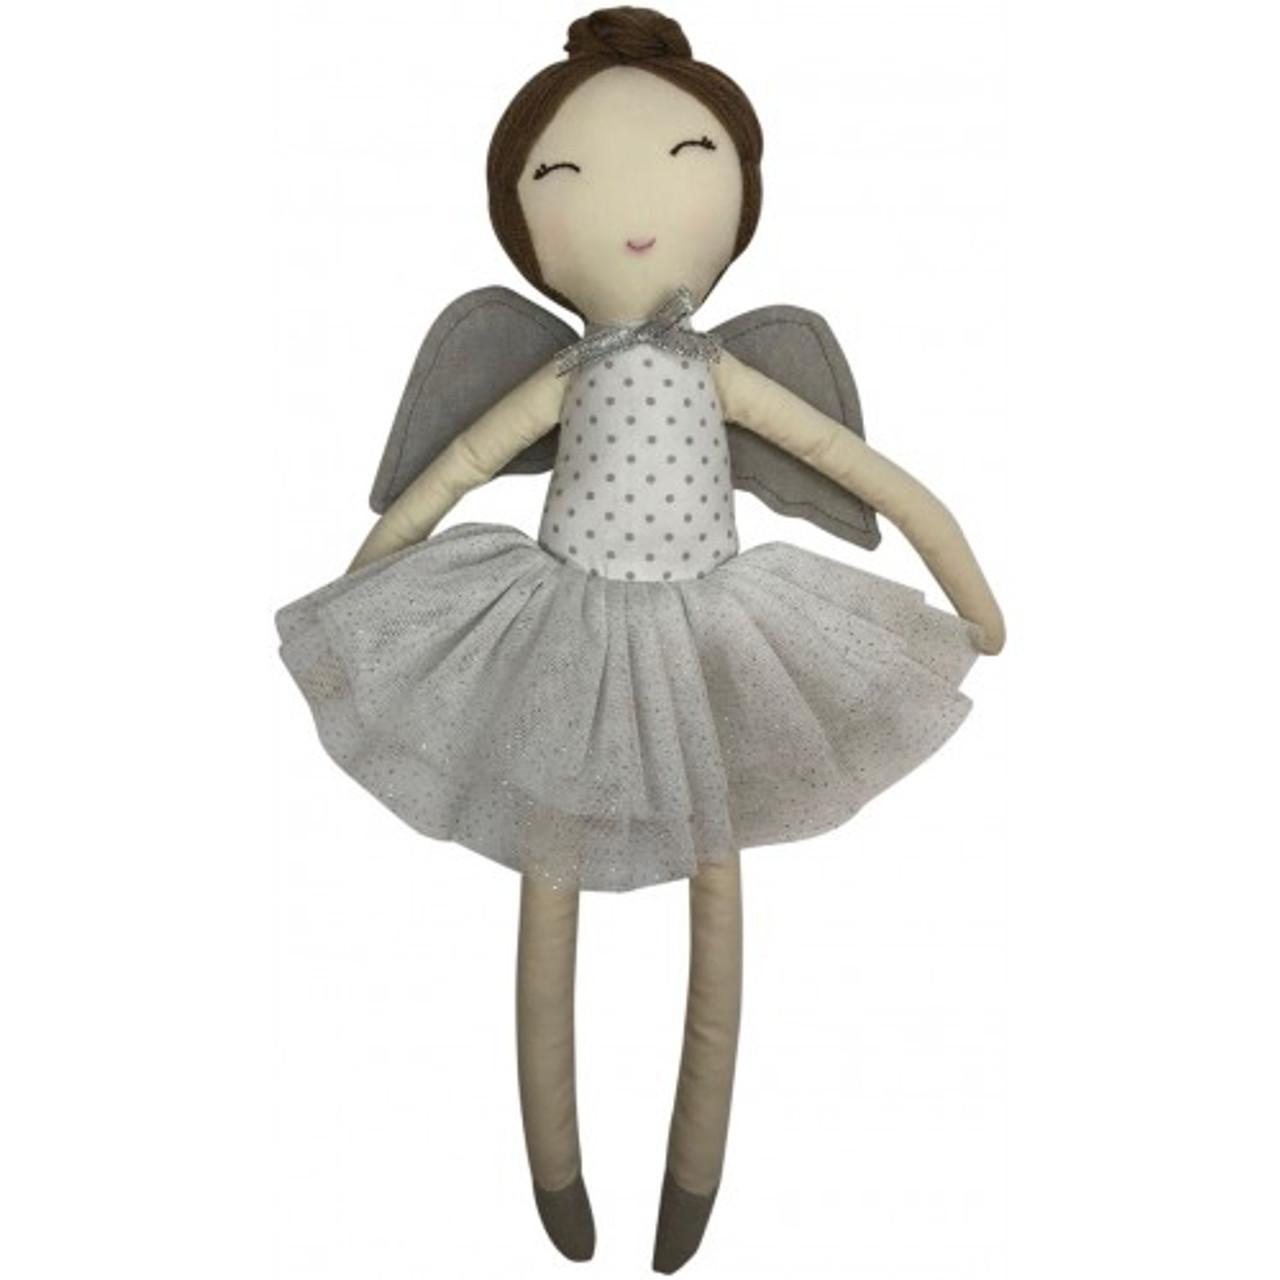 Urban Products Ballerina Doll 30cm - SILVER